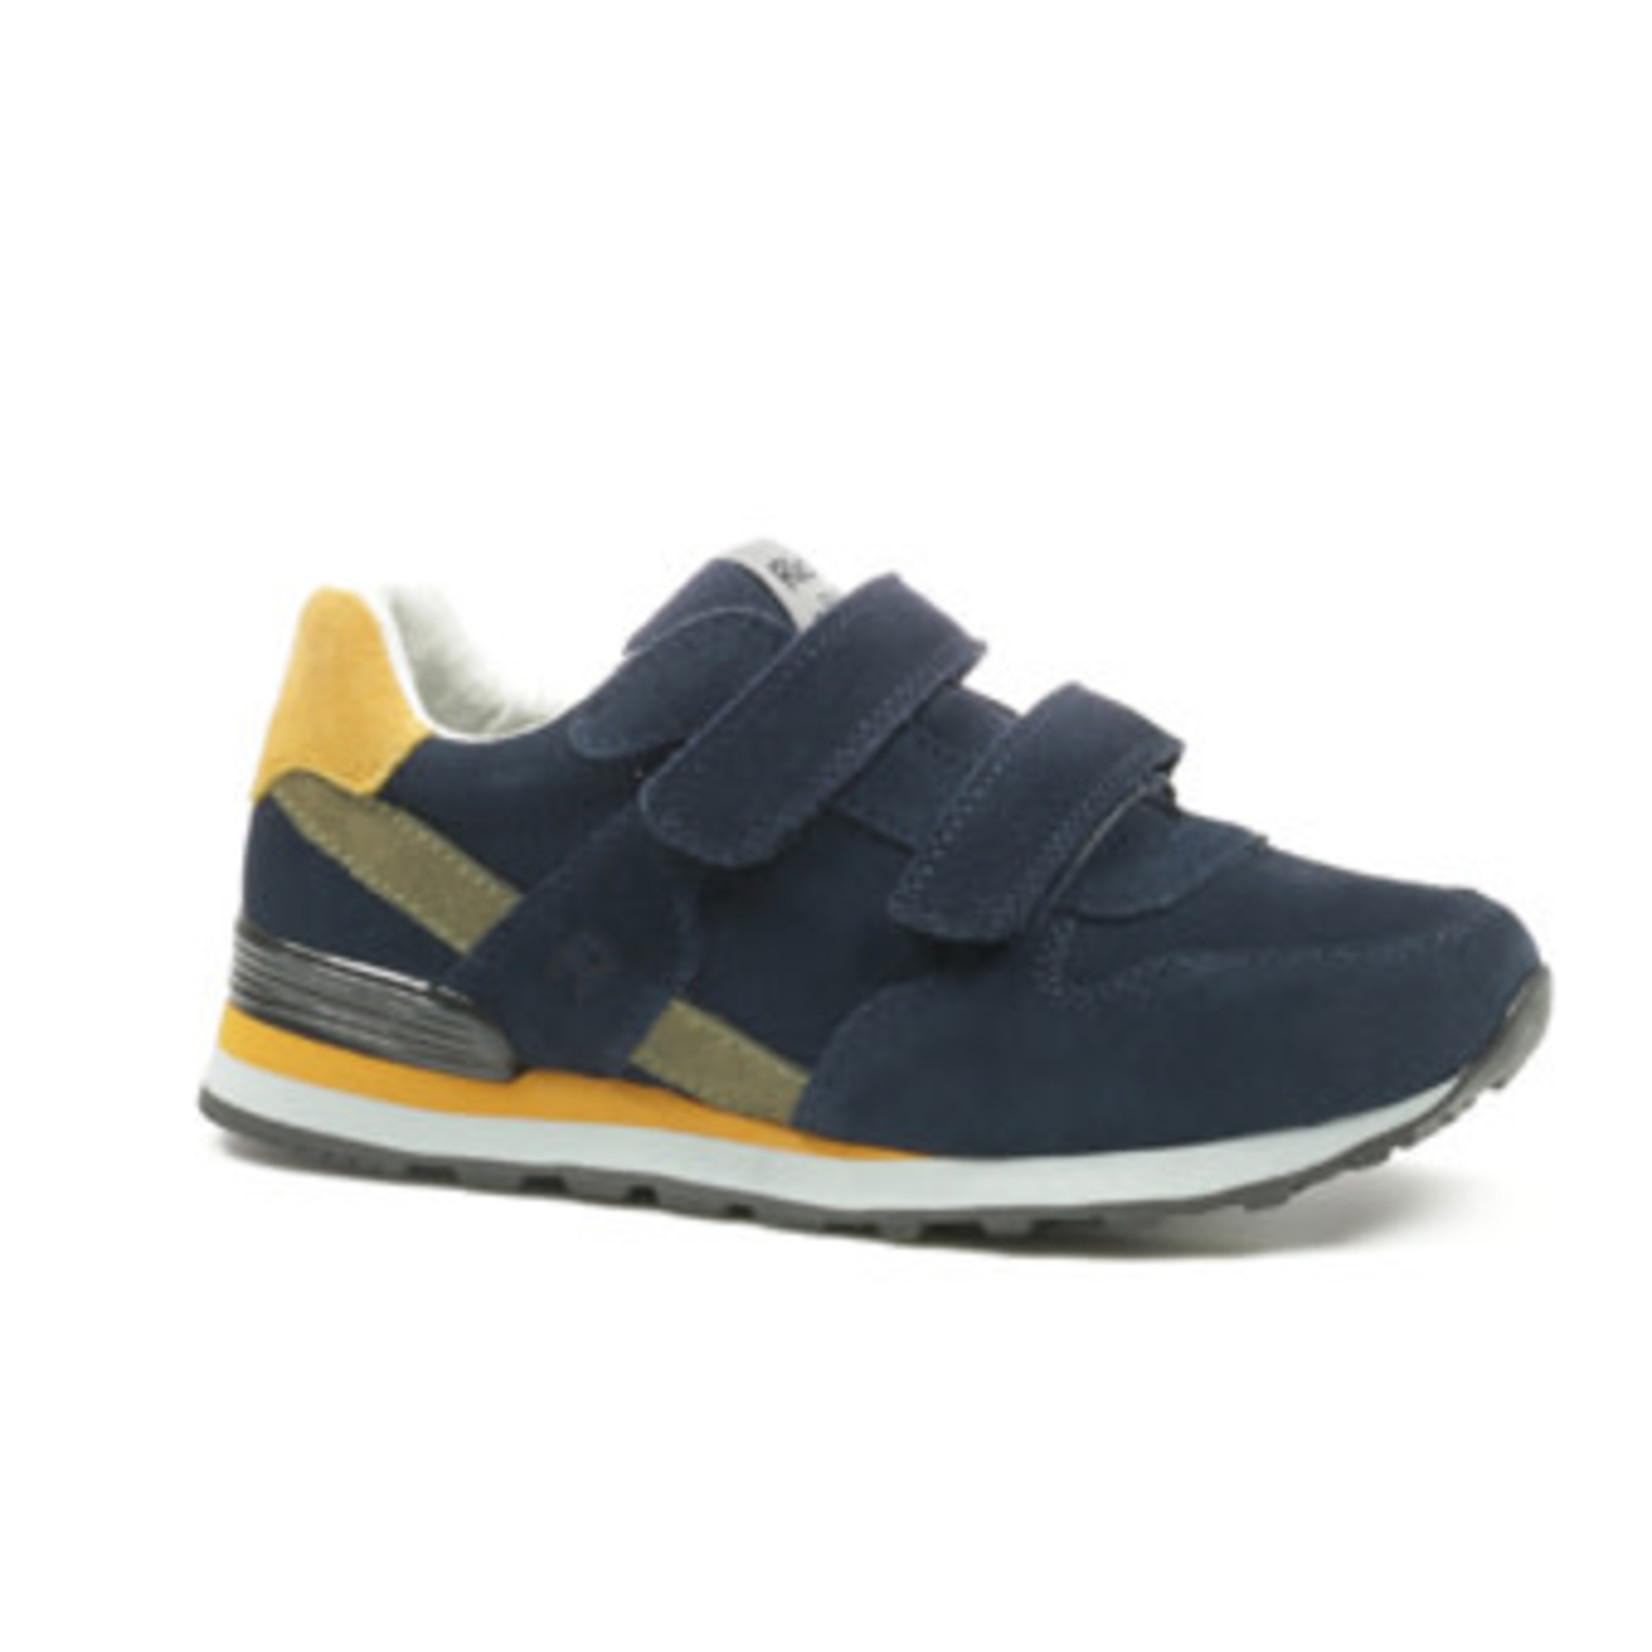 Richter Richter Sneaker Velcro Blauw